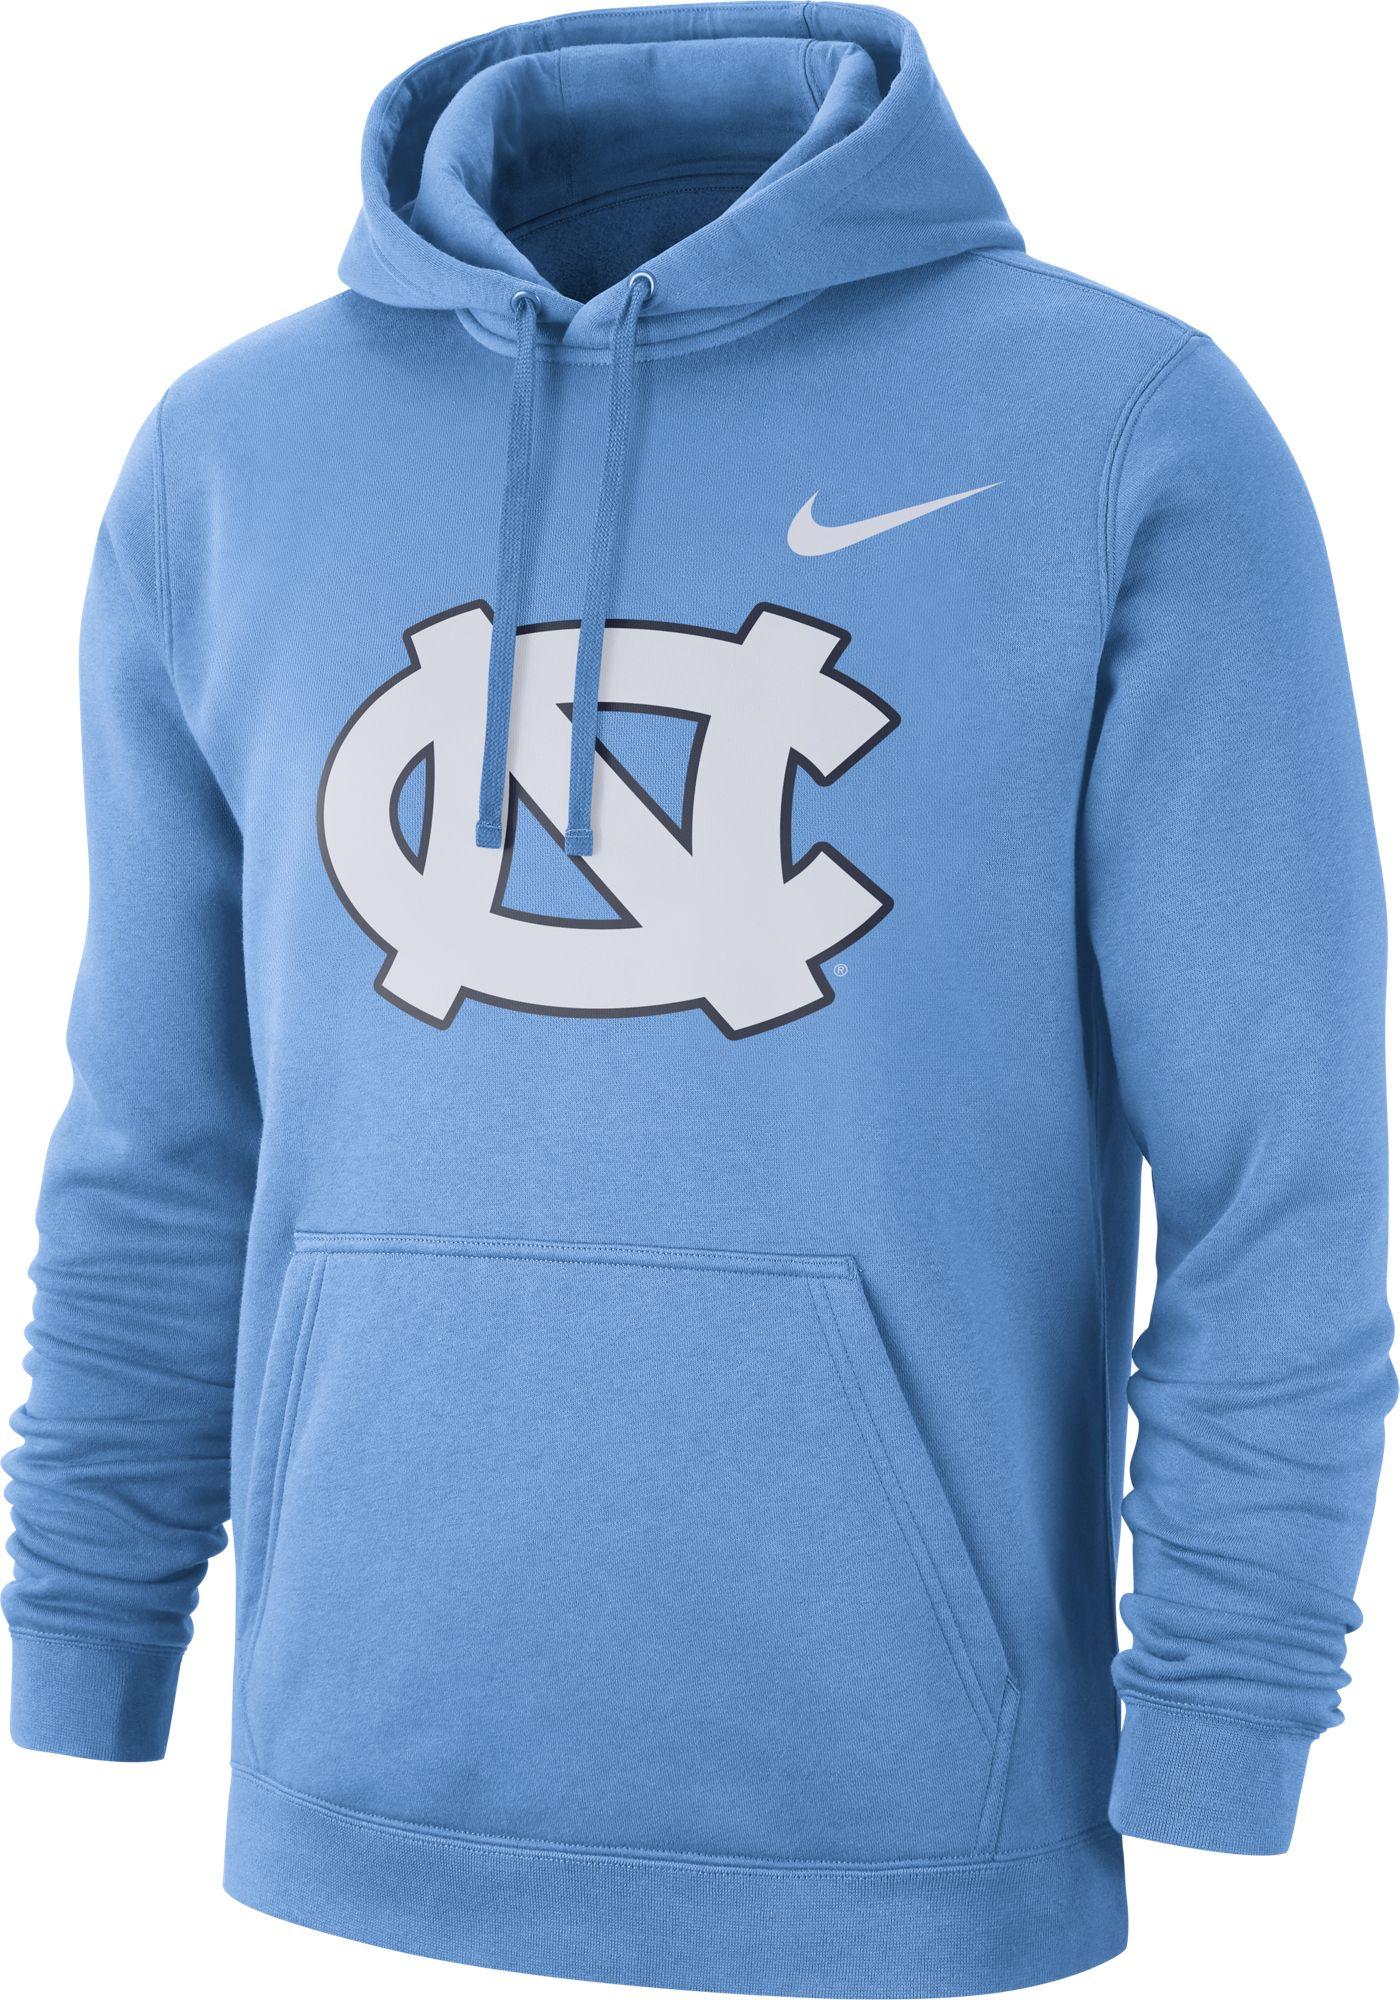 Nike Men's North Carolina Tar Heels Carolina Blue Club Fleece Pullover Hoodie